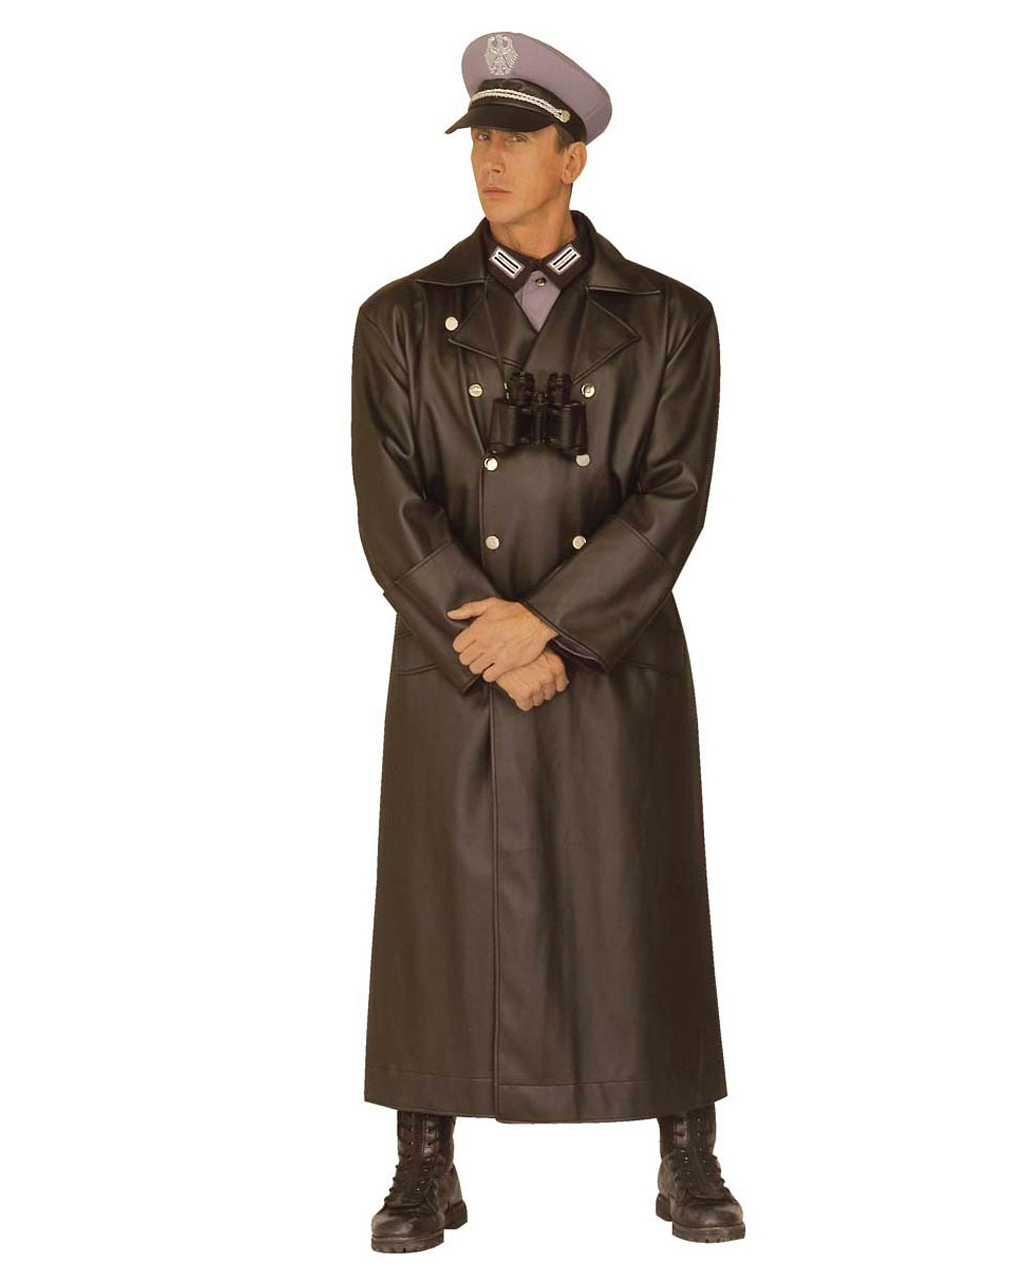 1a8469f6ef2 General Army Coat S | Black officer`s coat leatherette | horror-shop.com